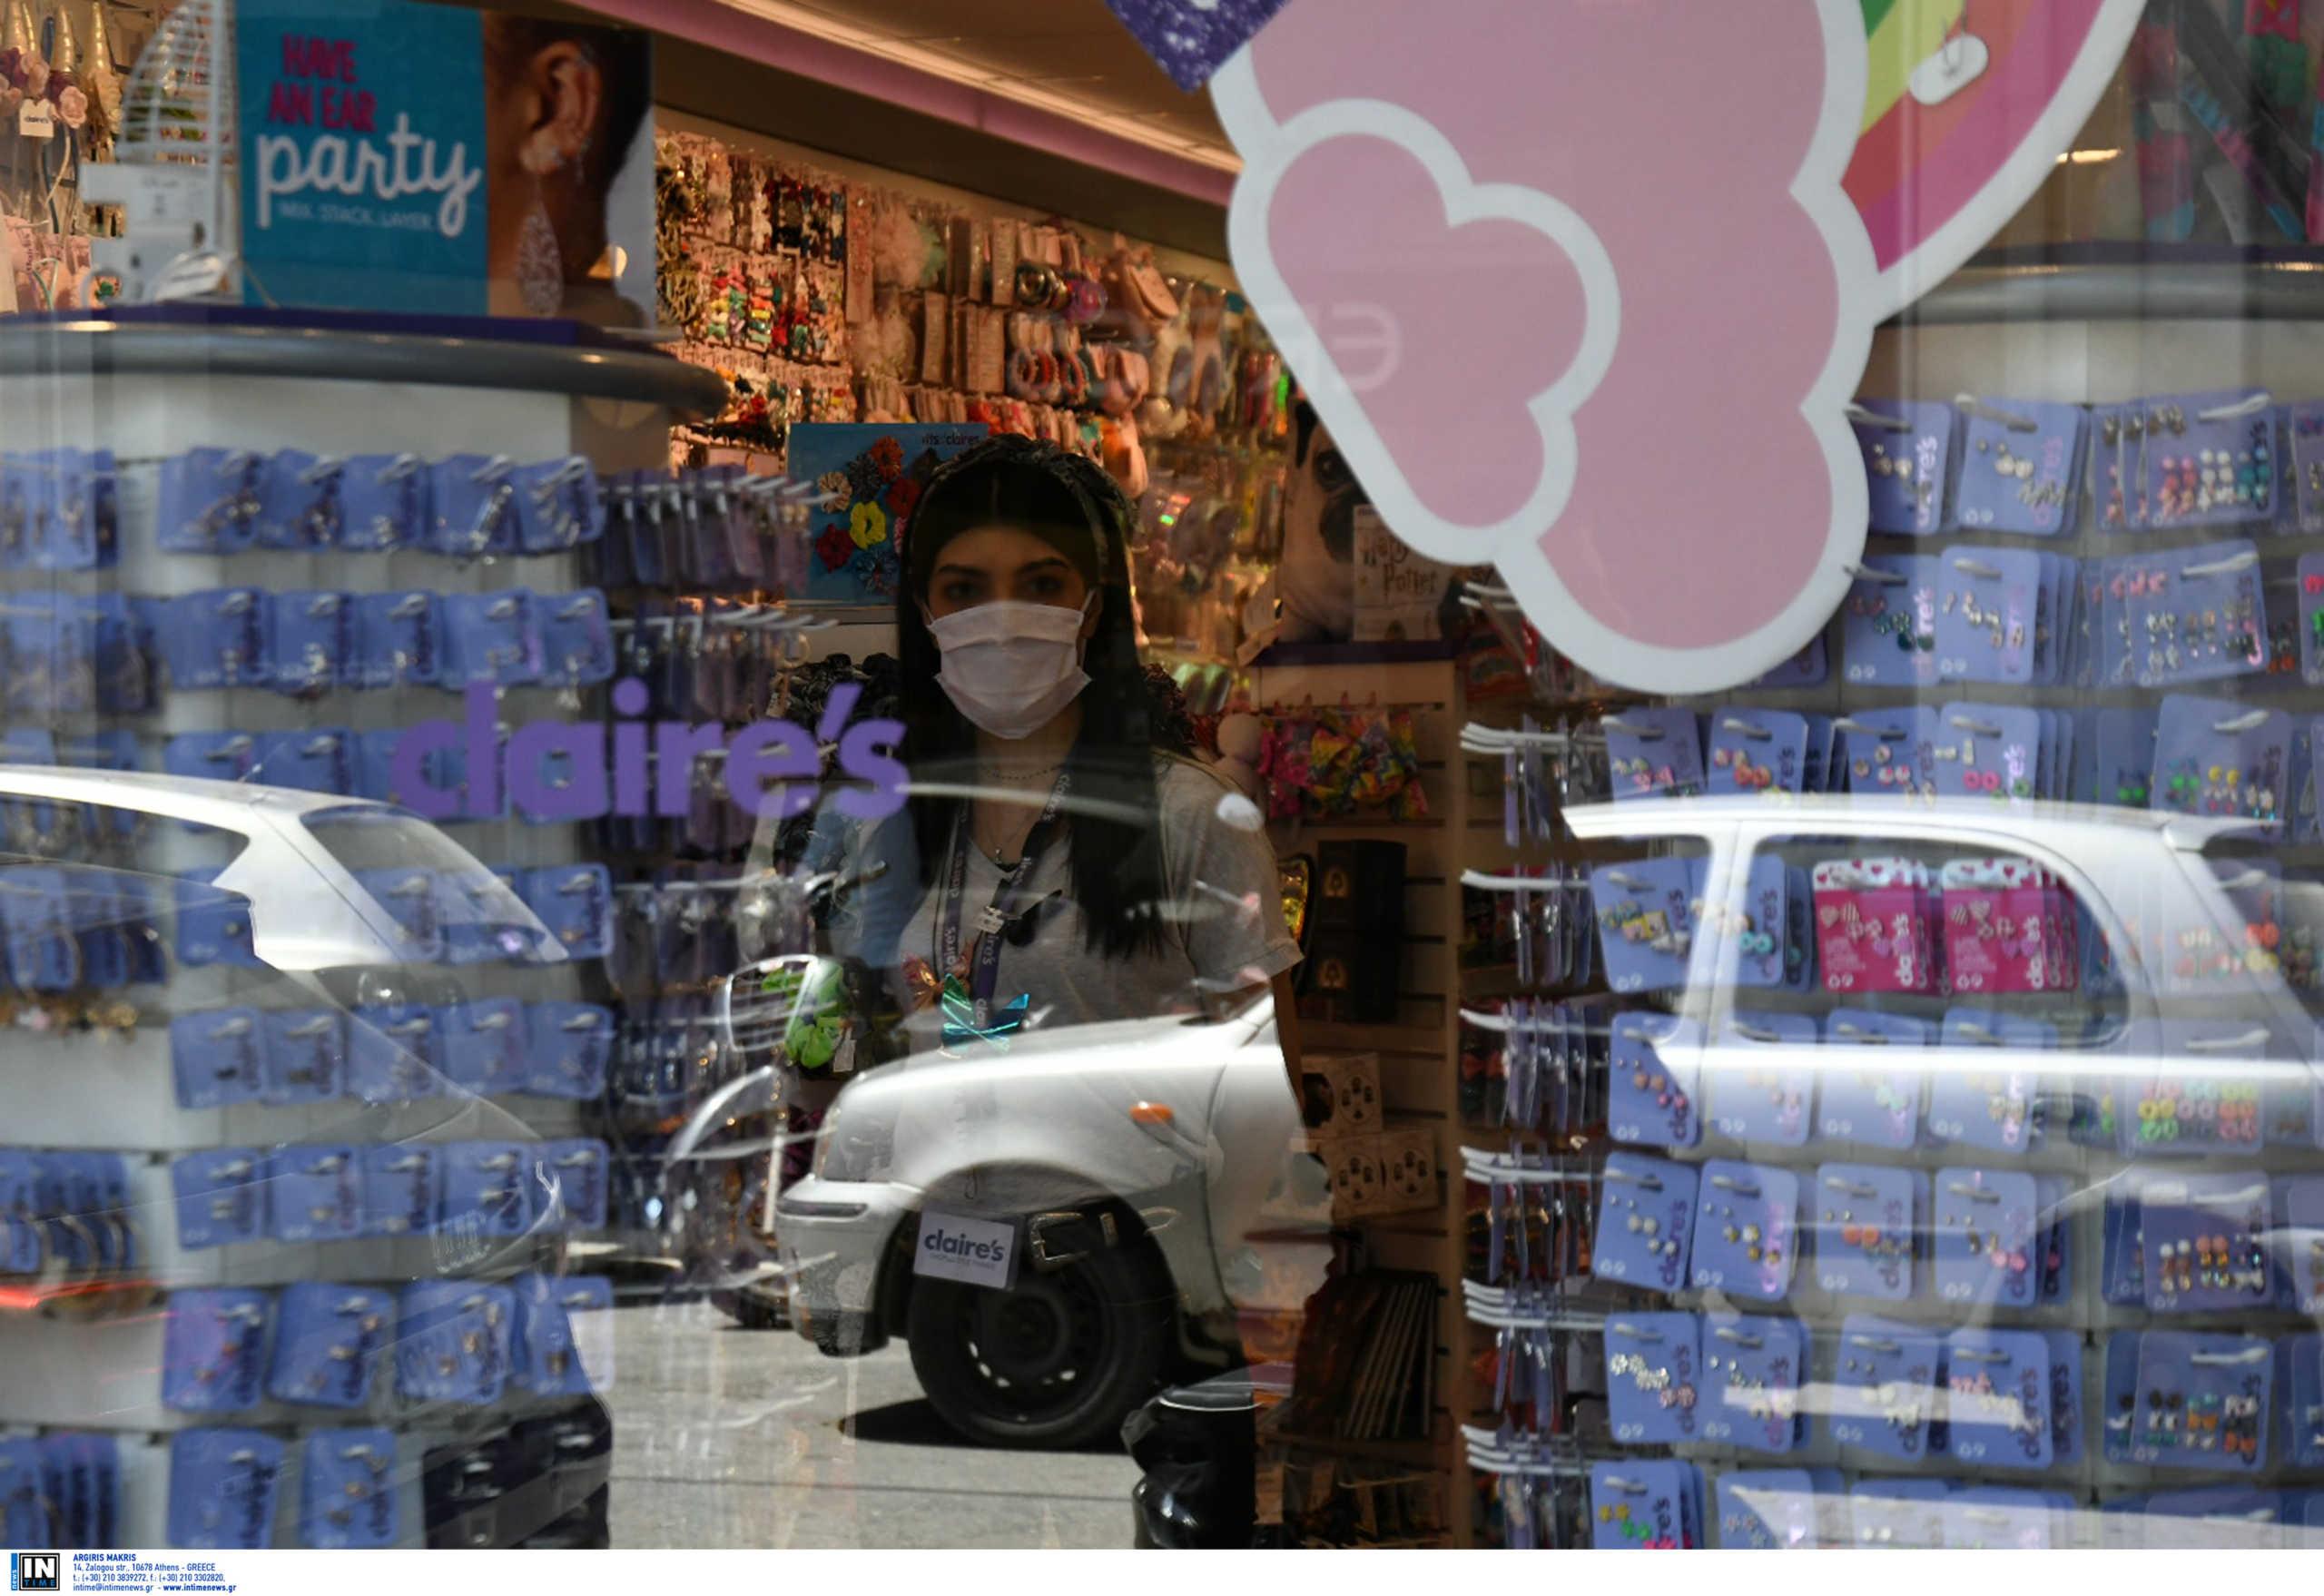 Black Friday… αλλιώς λόγω κορονοϊού – Τι να προσέξουν οι καταναλωτές